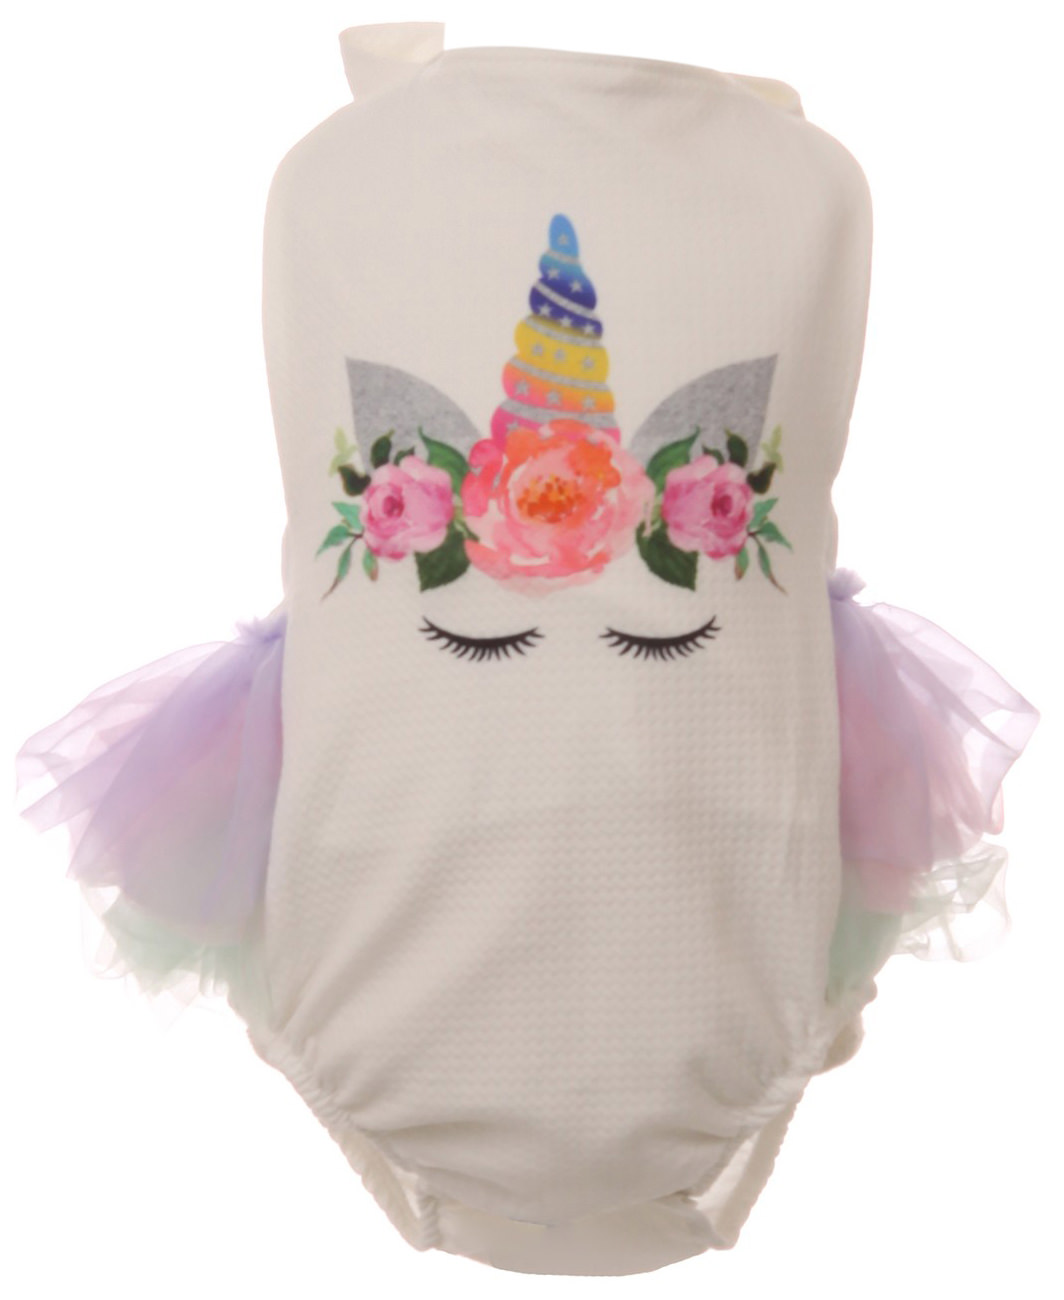 Baby Girls Halter Neck Unicorn Floral Tulle Party Onesie Romper Bodysuits Lavender 3M-6M (R243-05N)